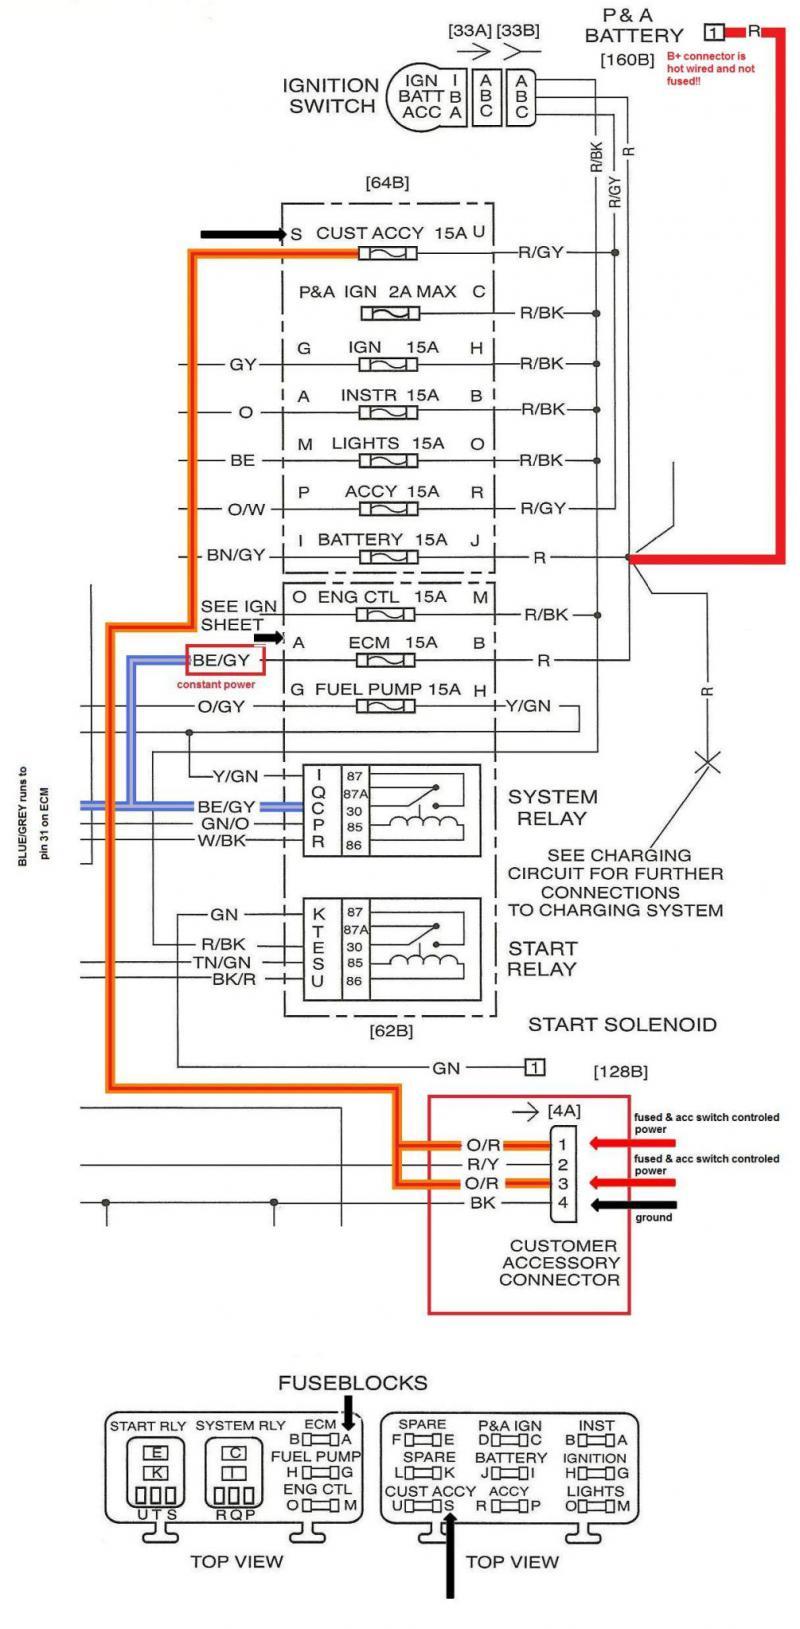 2011 Harley Davidson Street Glide Wiring Diagram